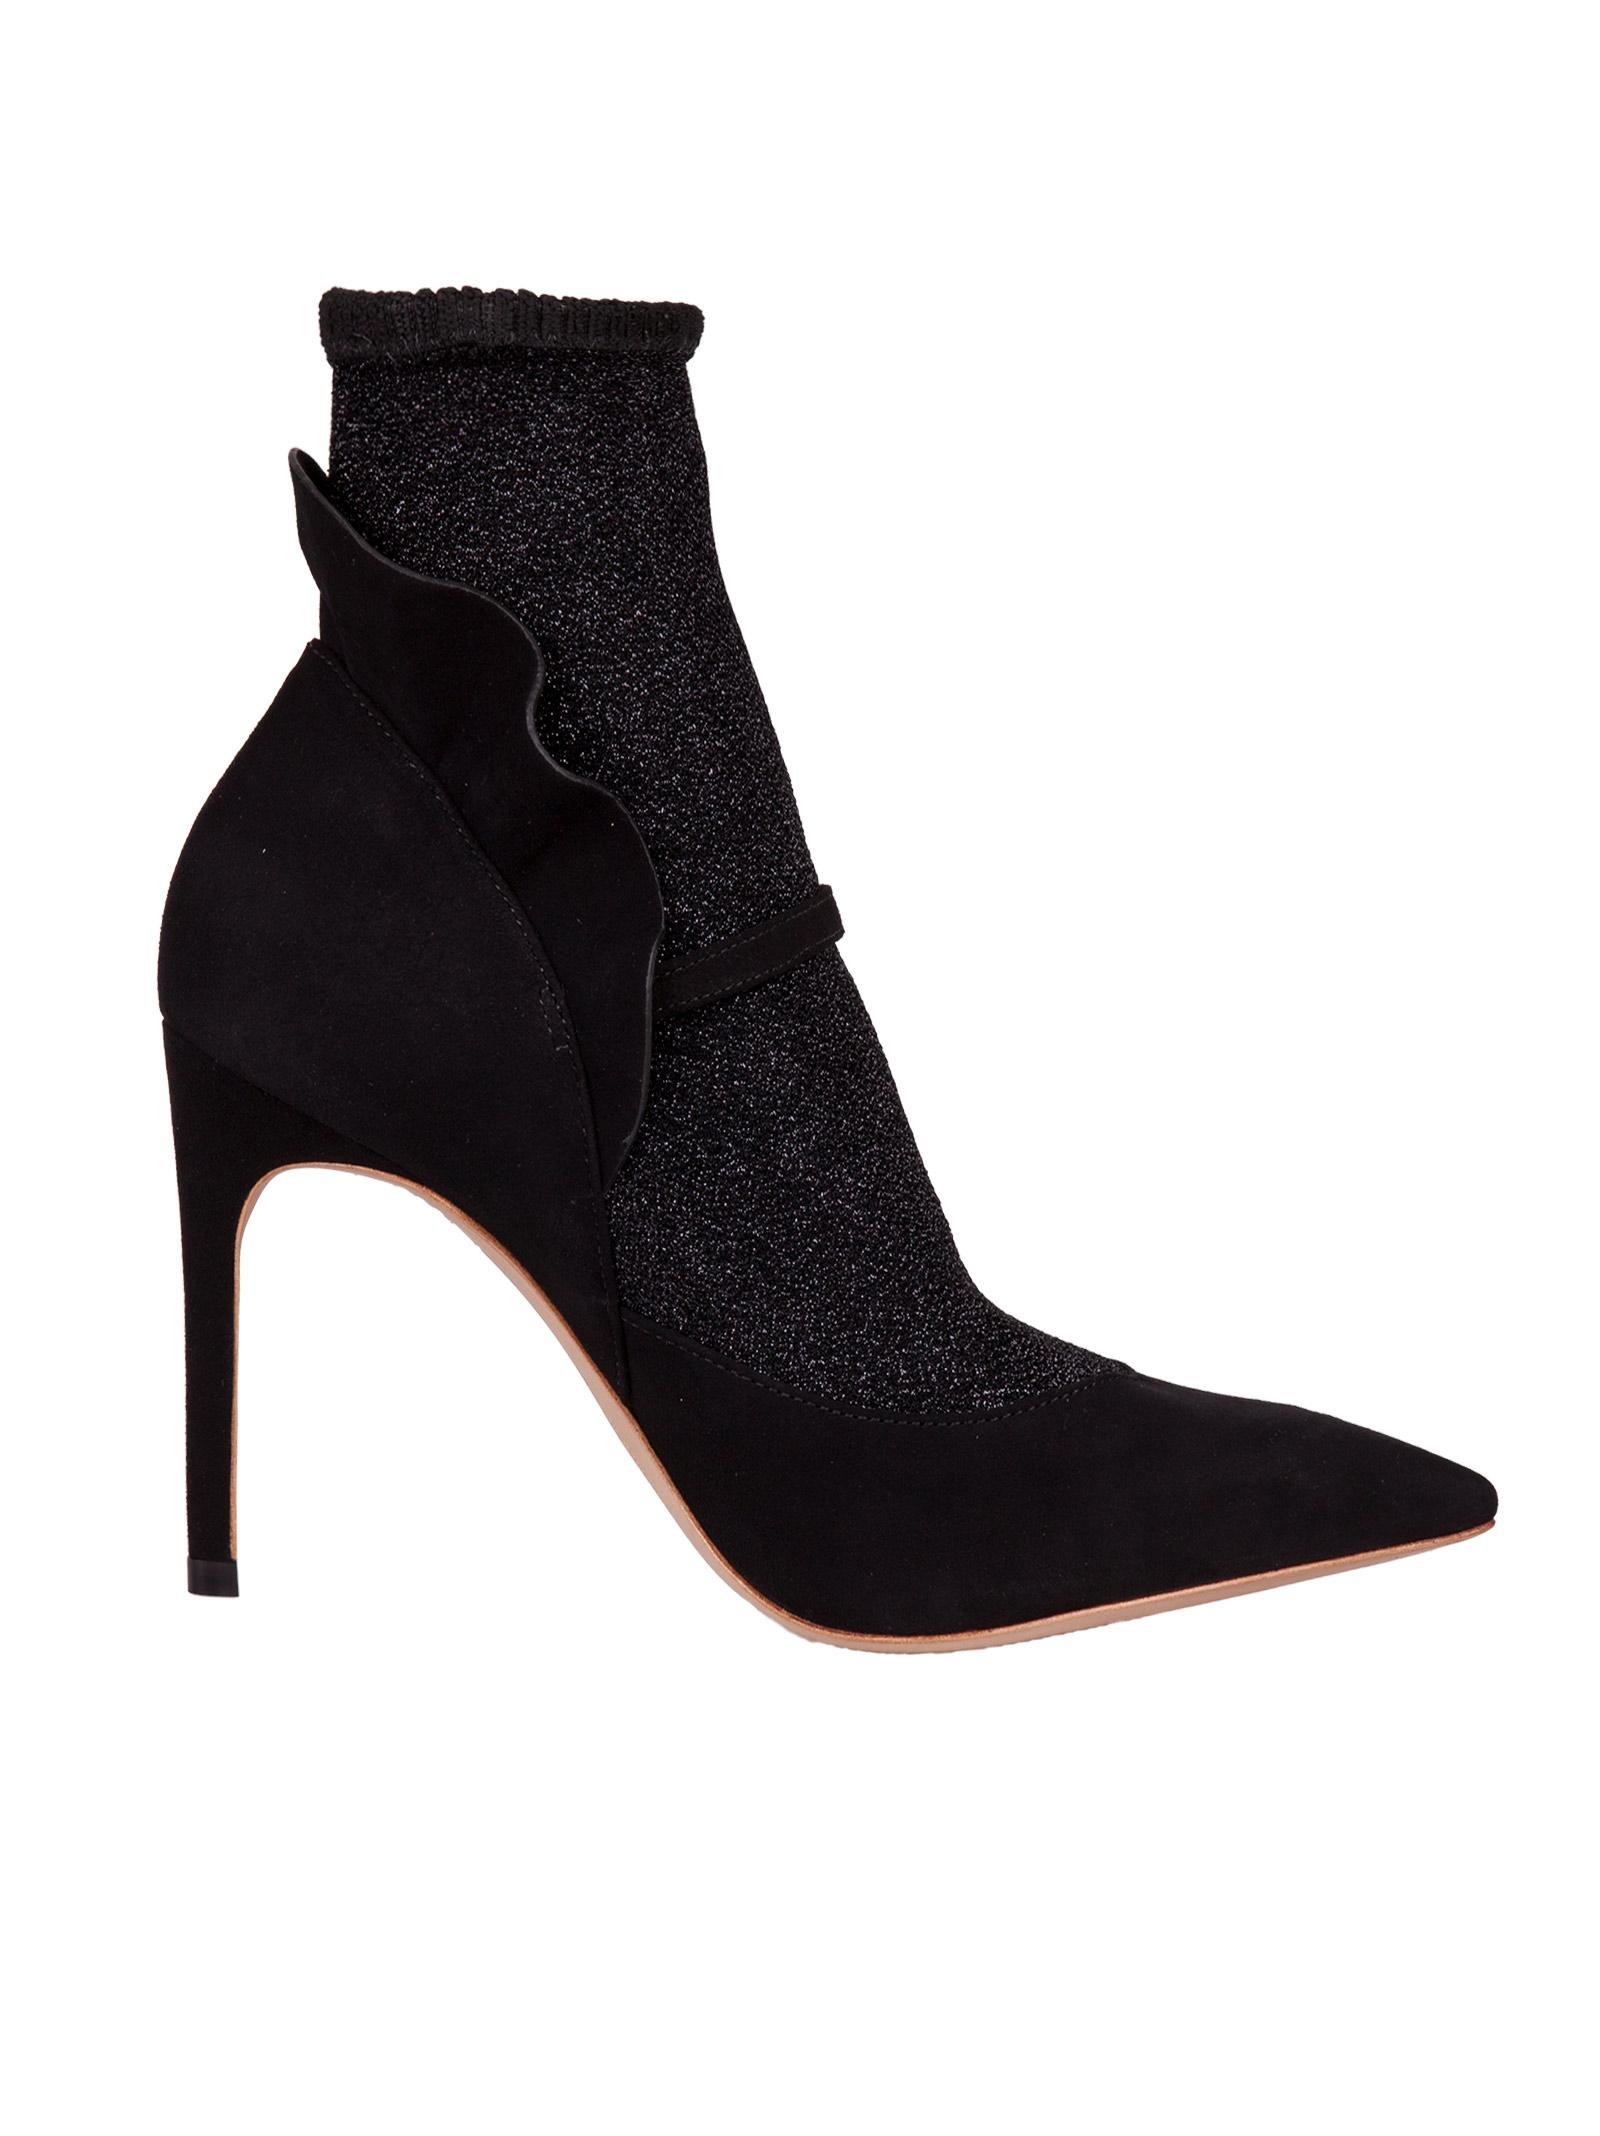 960e918a273 Michele Franzese Moda. 0. Sophia boots Sophia Webster